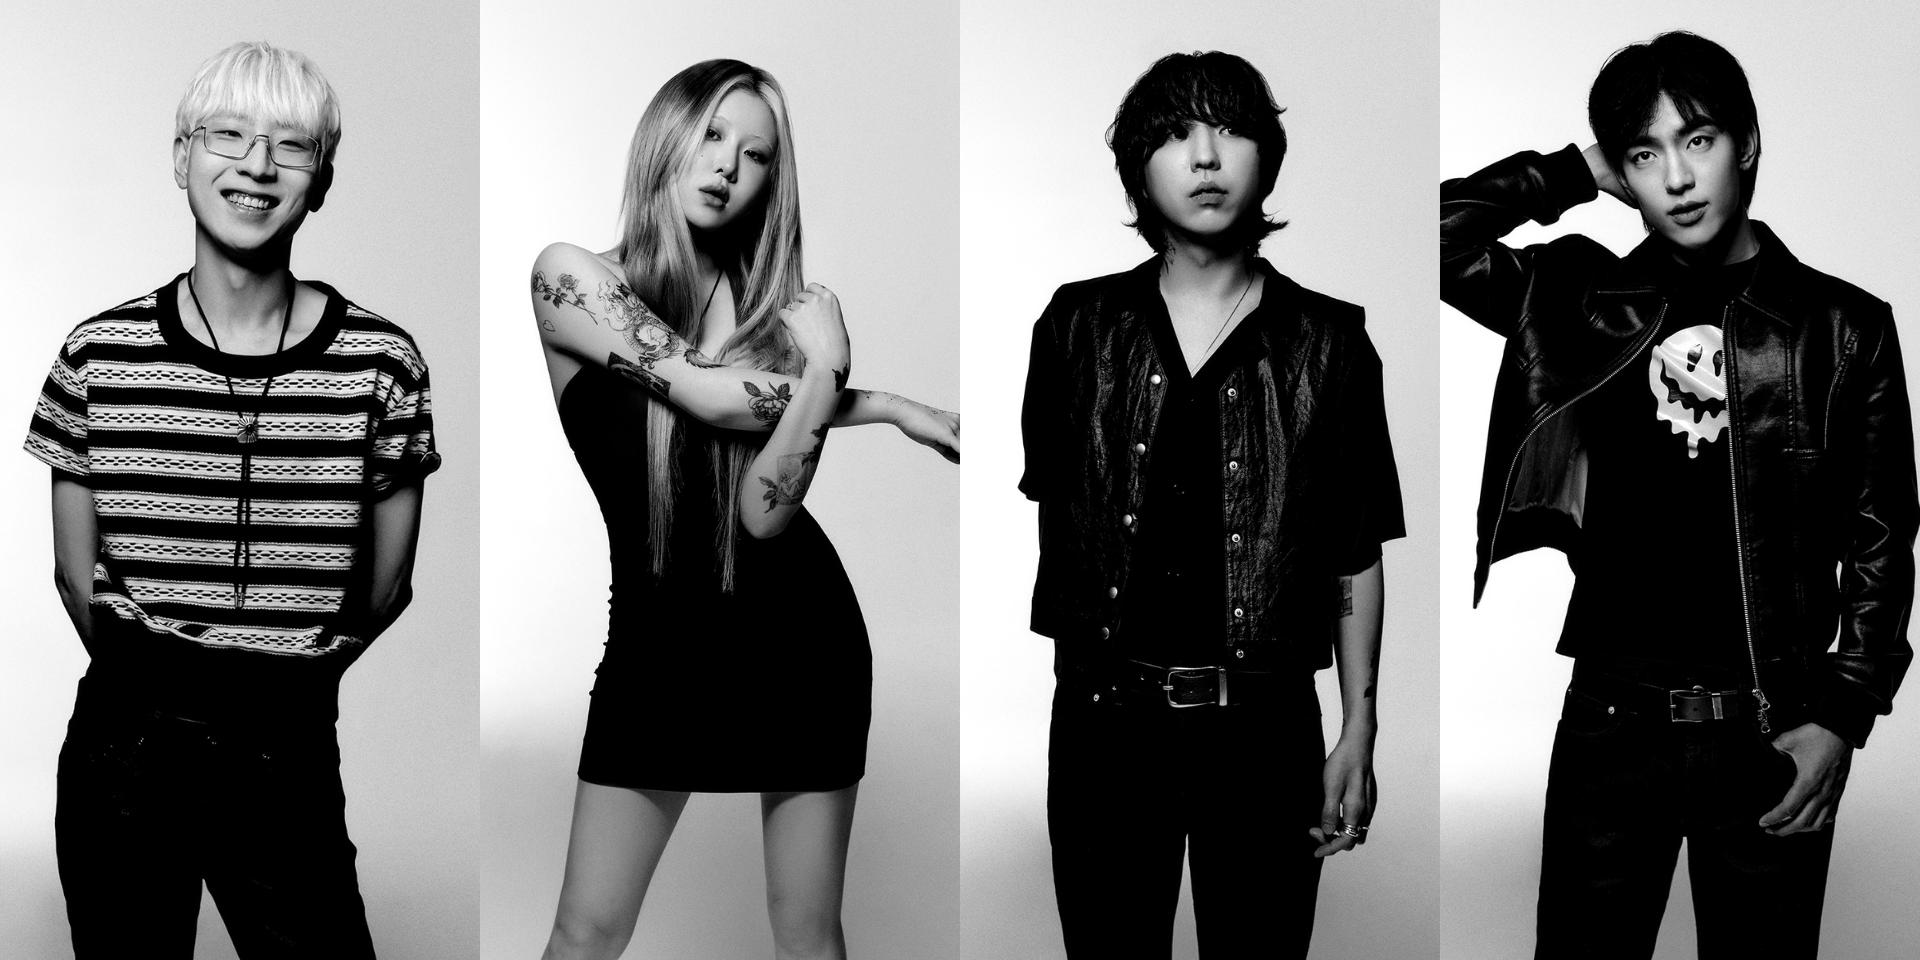 Yerin Baek's rock band 'The Volunteers' to drop debut album this month